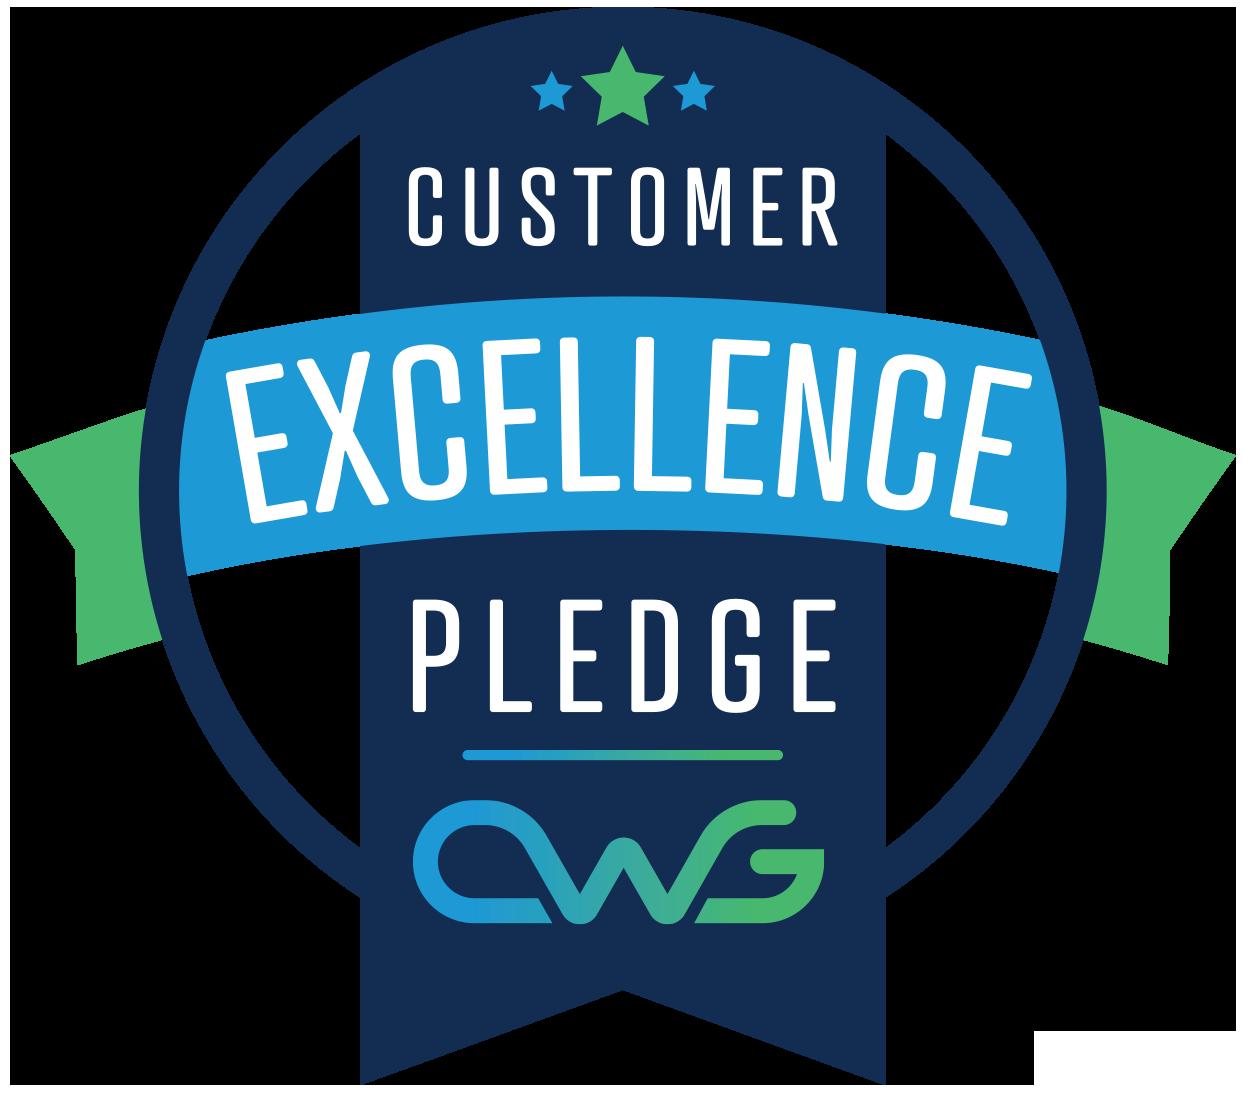 Customer Excellence Pledge